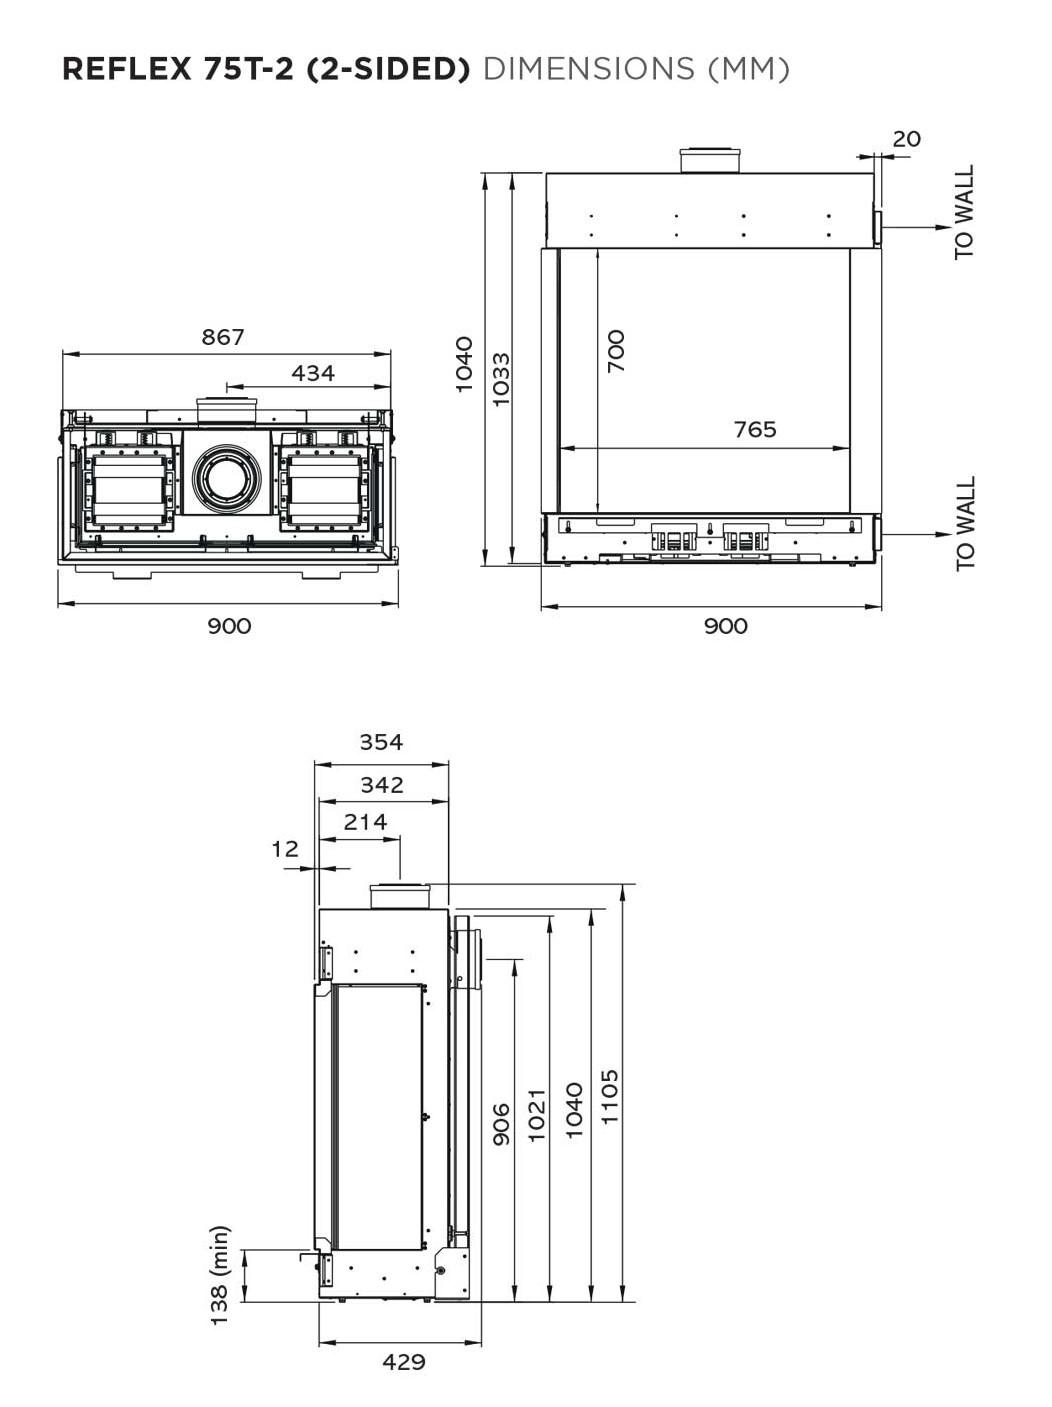 Gazco Reflex 75T-2 two sided gas fire dimensions